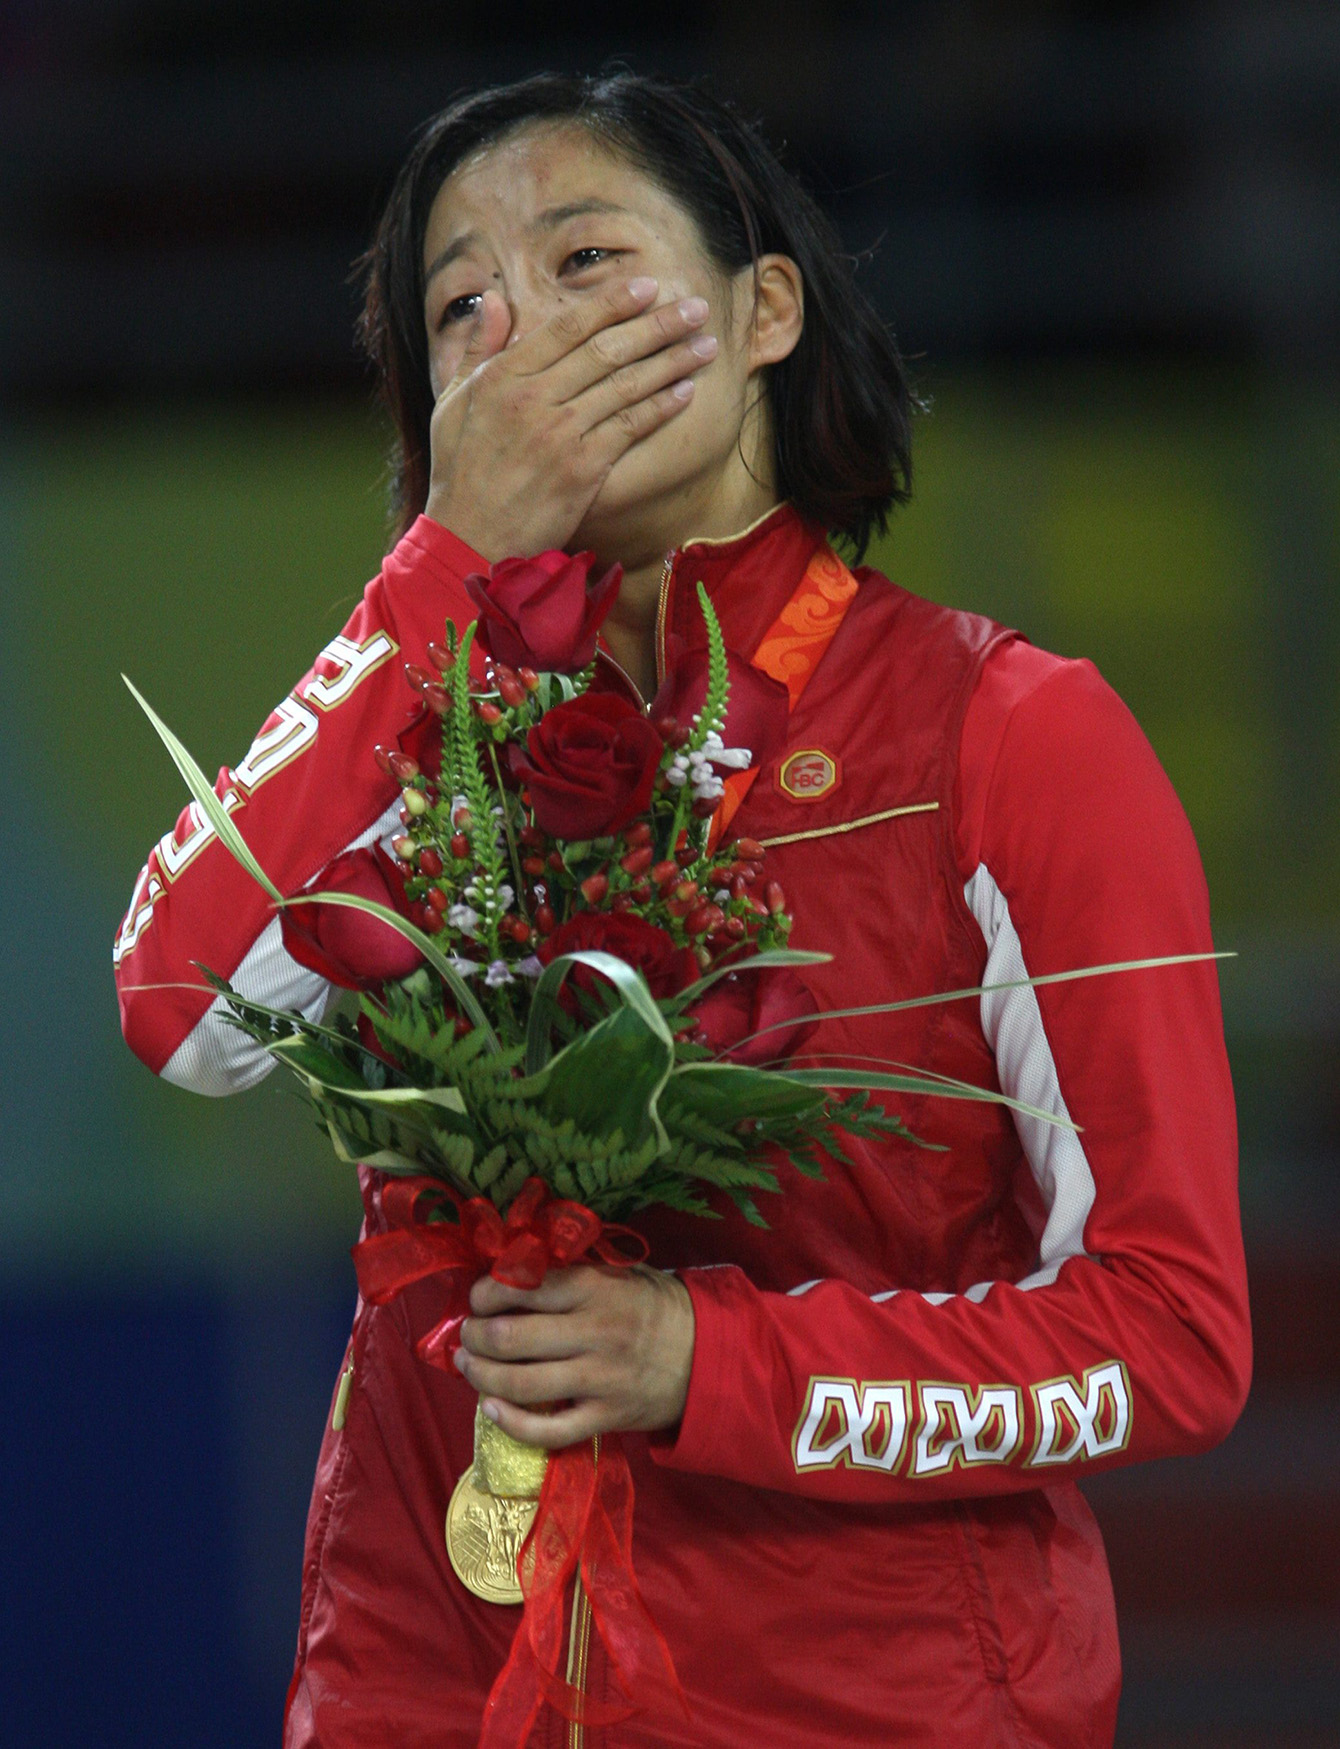 Carol Huynh émotive sur le podium